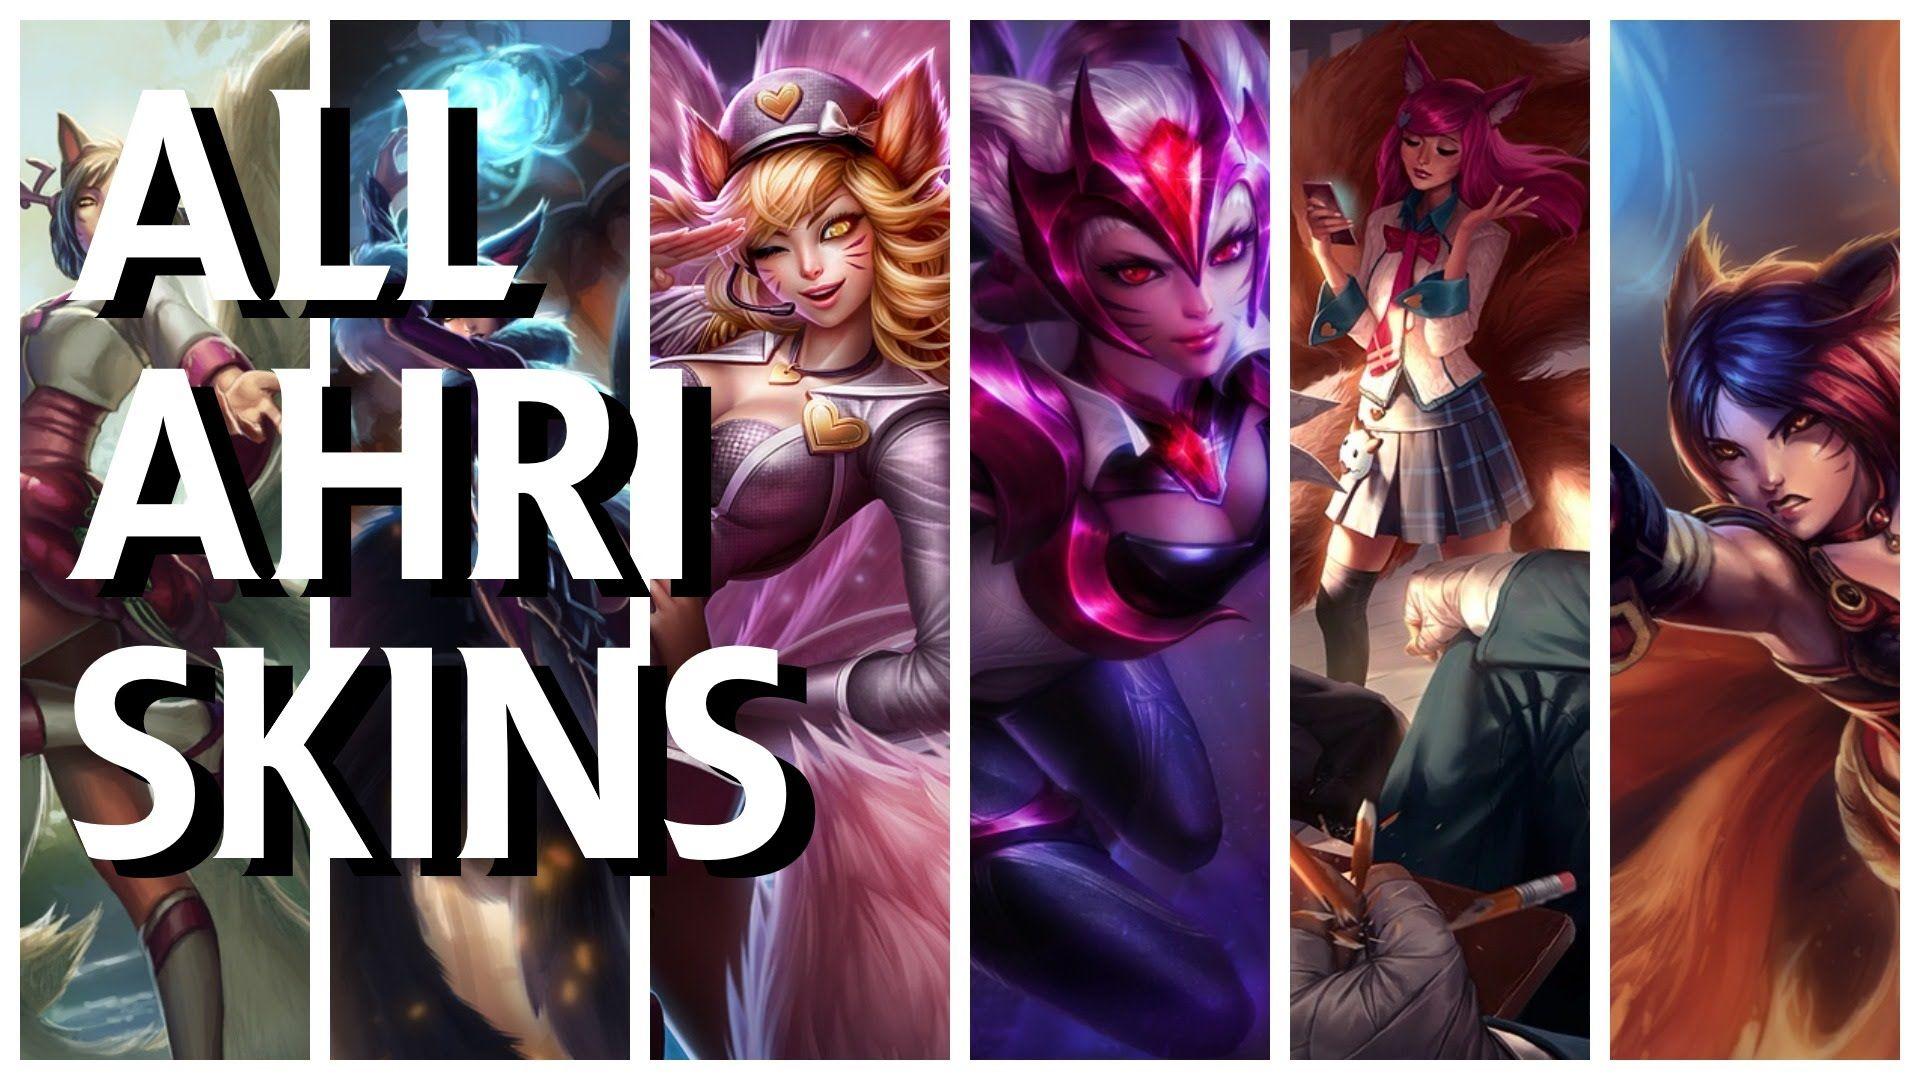 All Ahri Skins (Dynasty, Midnight, Foxfire, Popstar, Challenger, Academy)  in details.